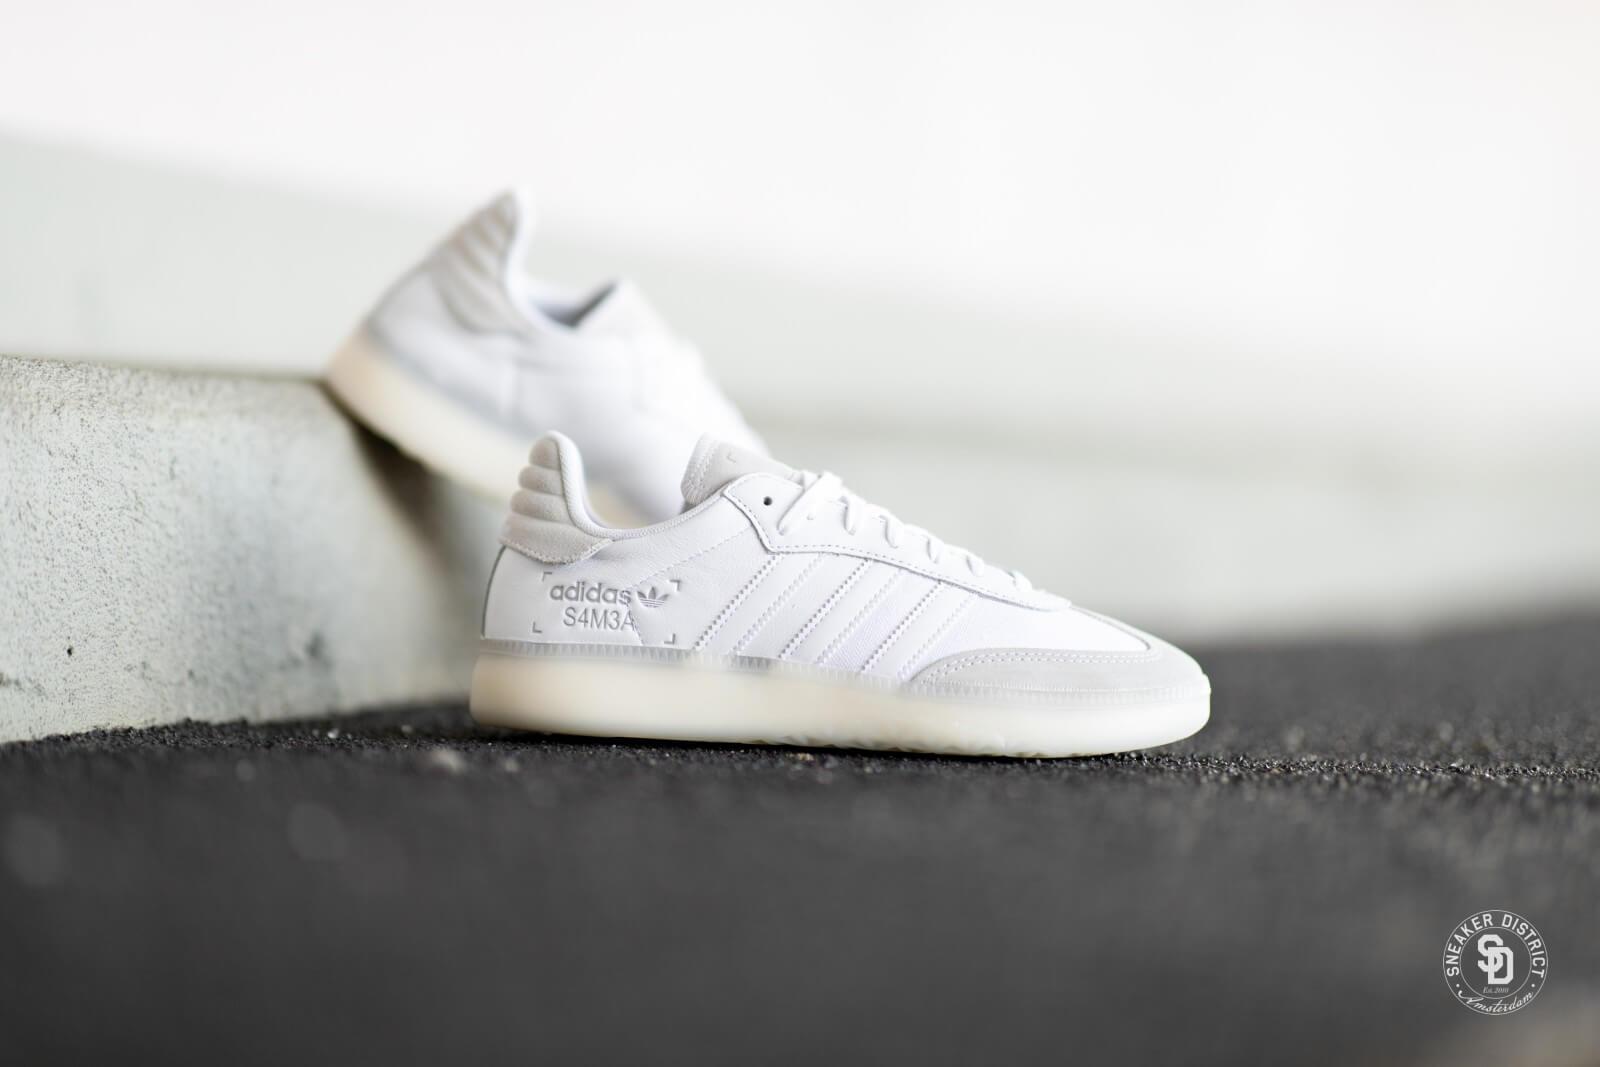 Adidas Samba RM White/Beige - BD7486